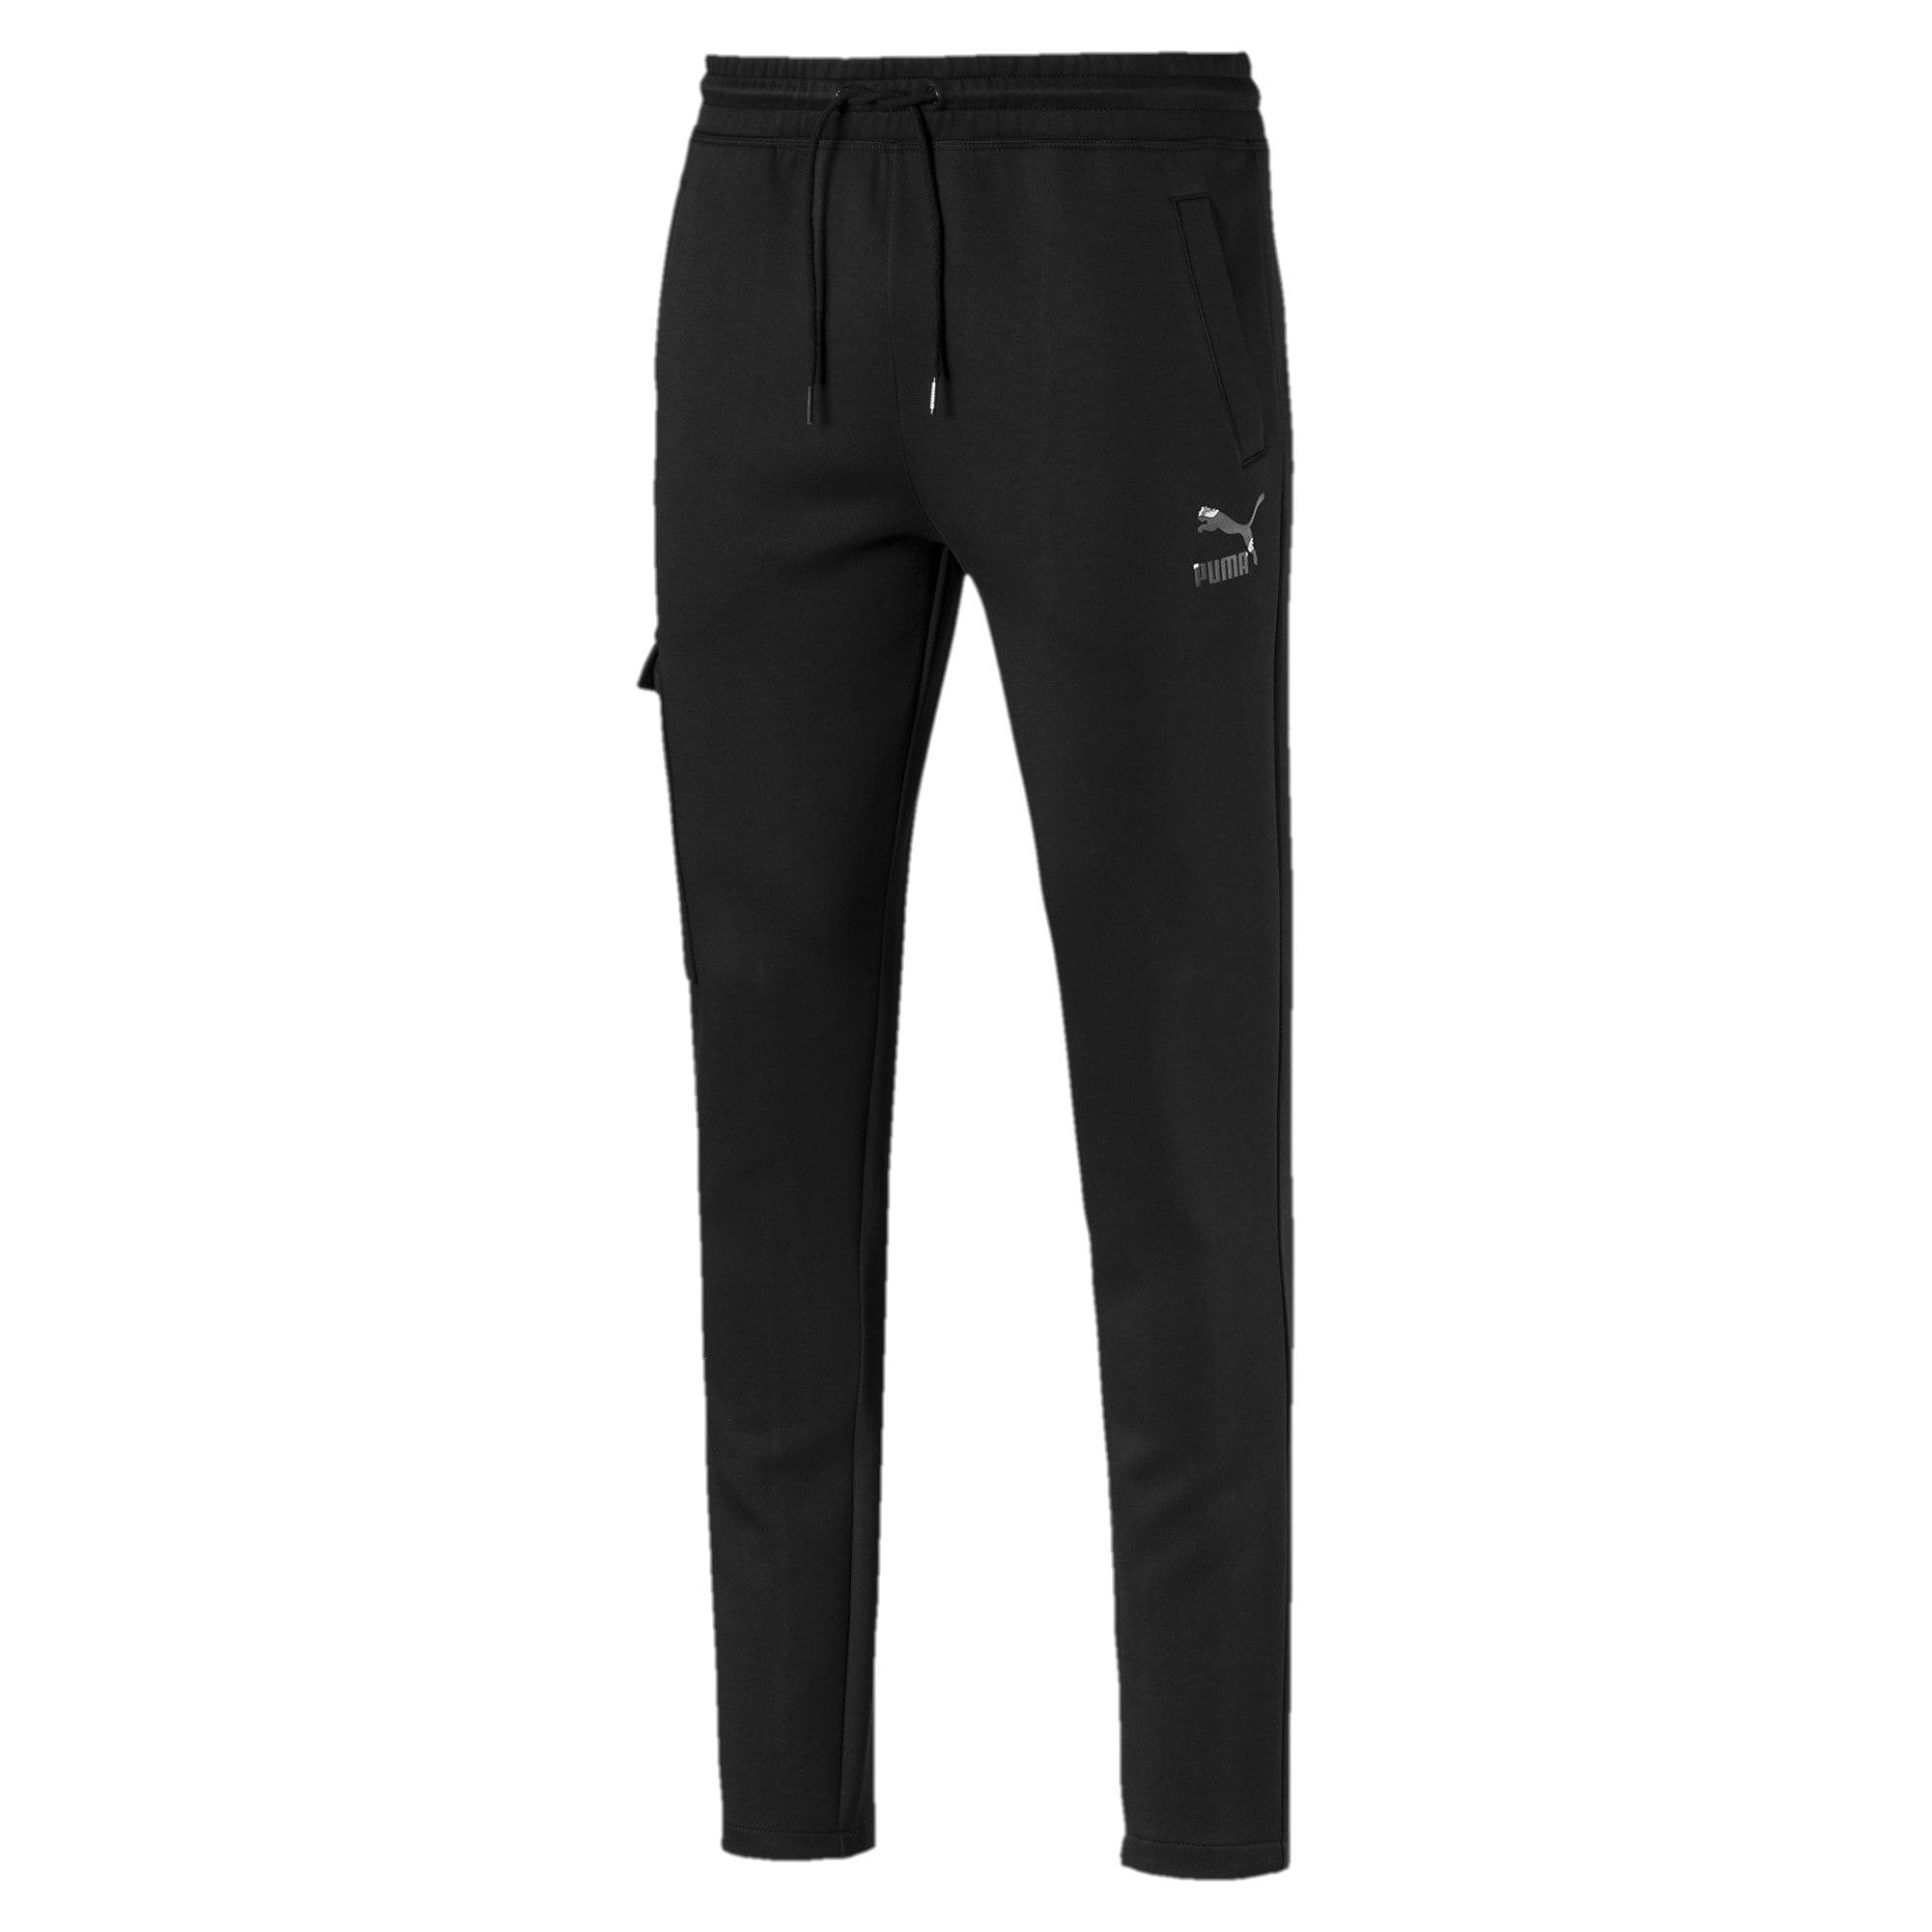 Thumbnail 4 of Classics Pocket Pants OH, Cotton Black, medium-IND